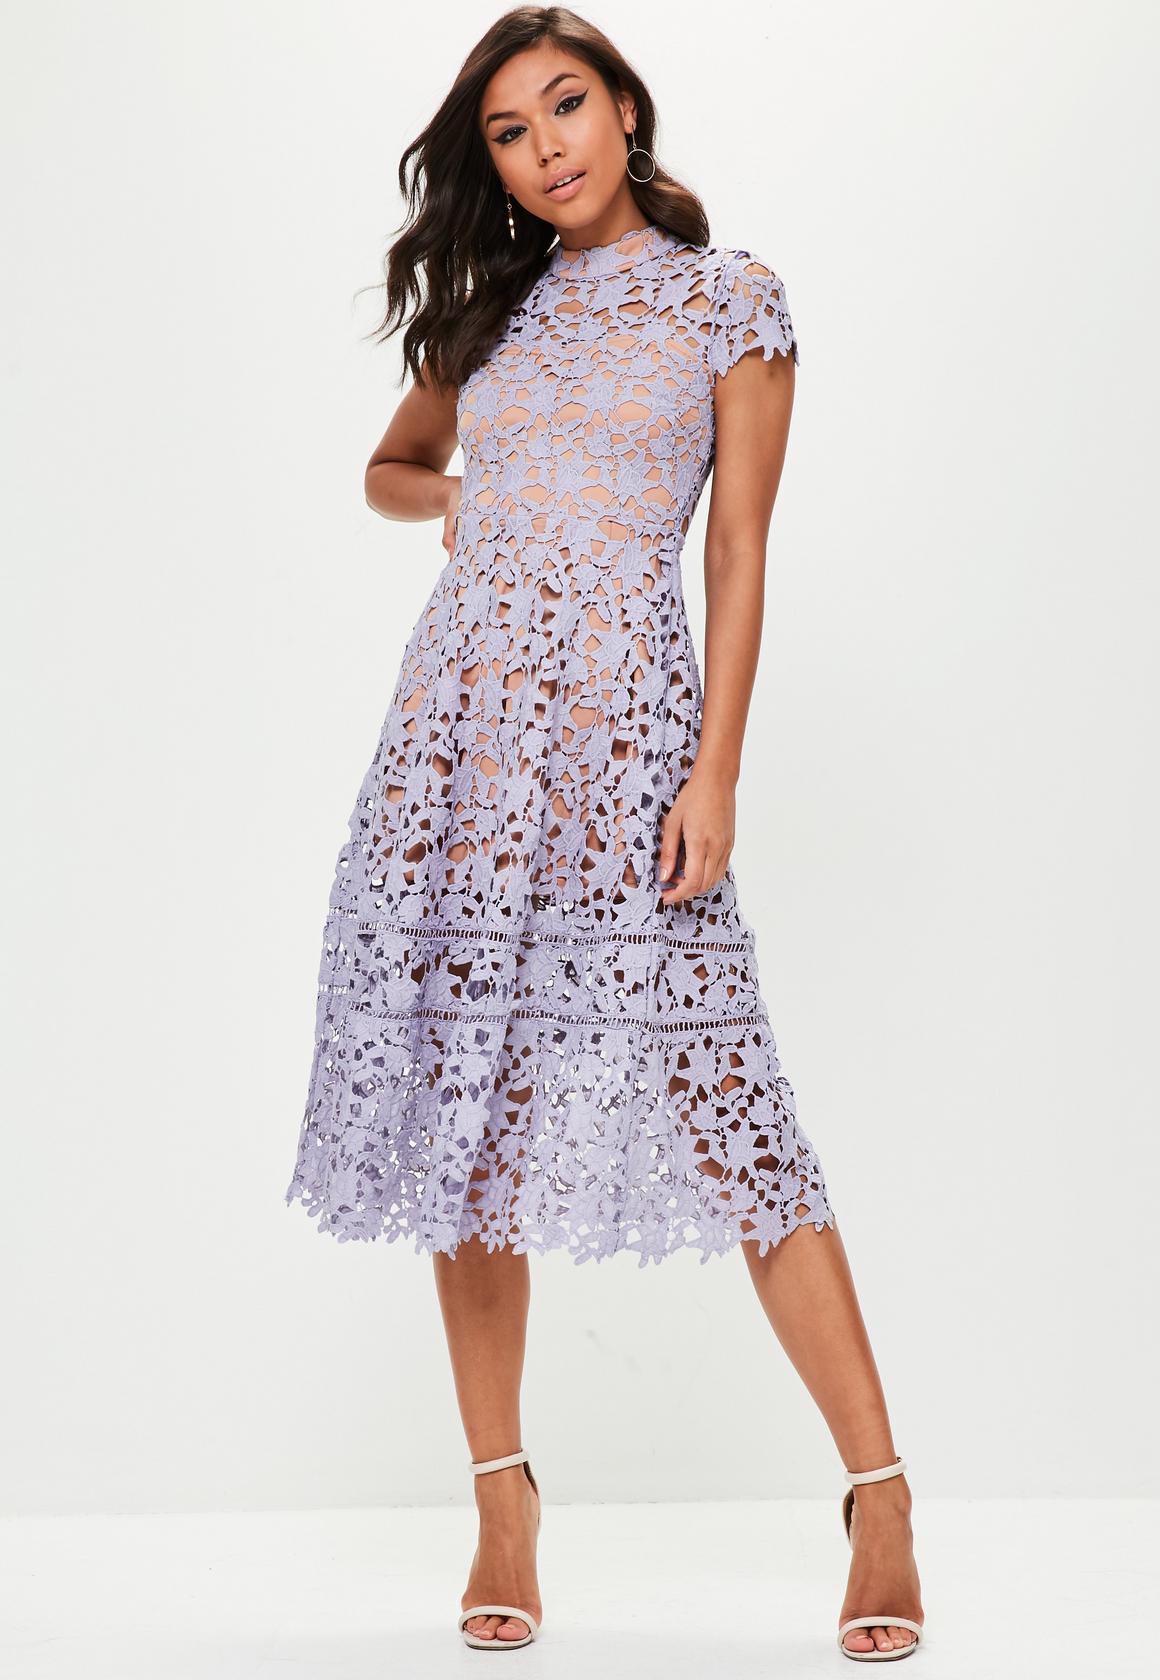 b990bc07a2d94f ASOS koronkowa sukienka rozkloszowana self 38 M - 7008234284 ...